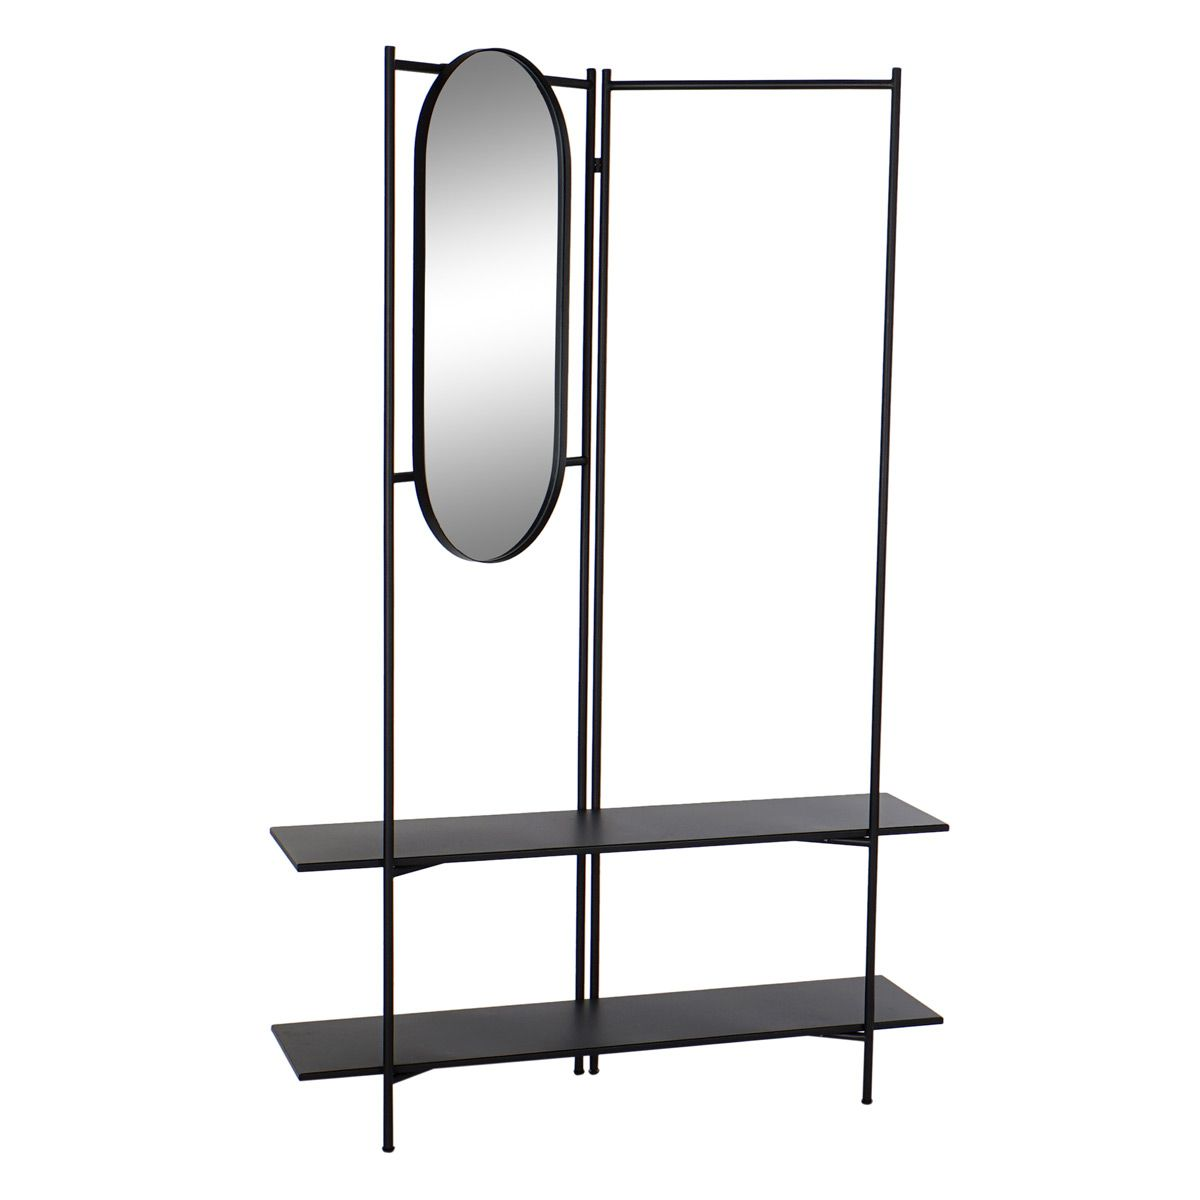 Meuble d'entrée en métal avec miroir